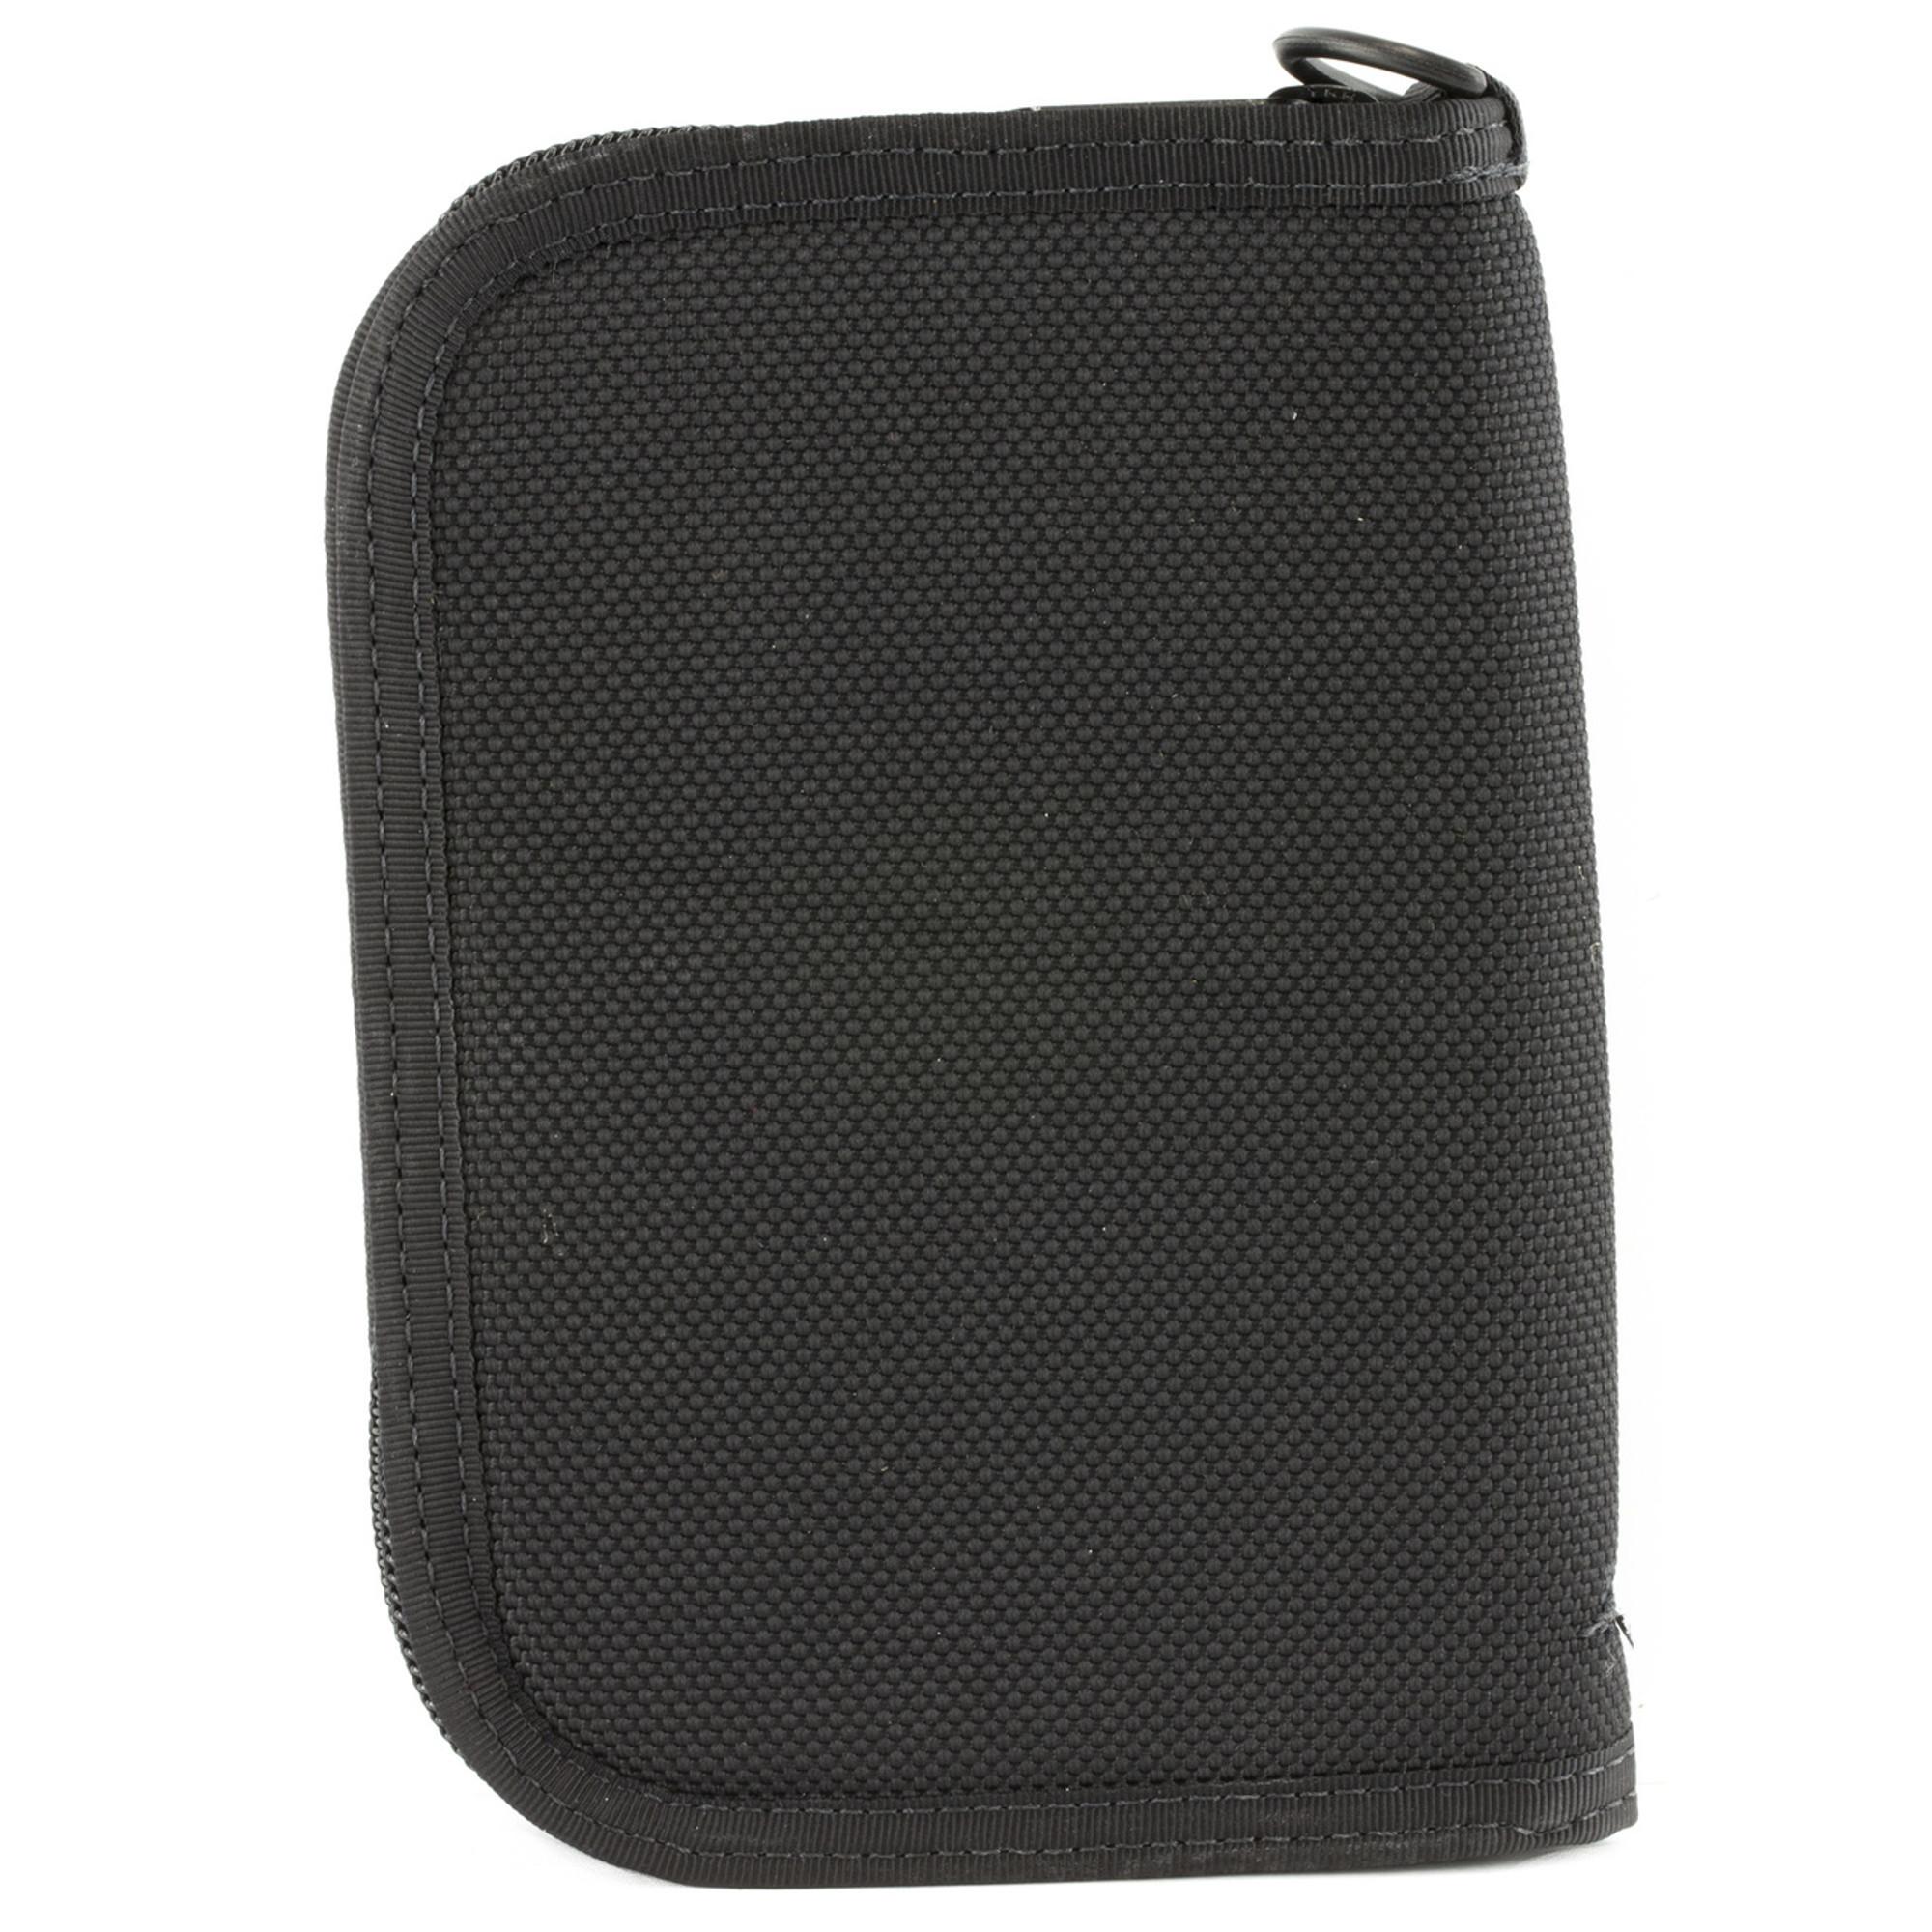 Black N65BA92Z0 DeSantis Gunhide Pistol Pack Holster Fits P3AT//P32 Right Hand